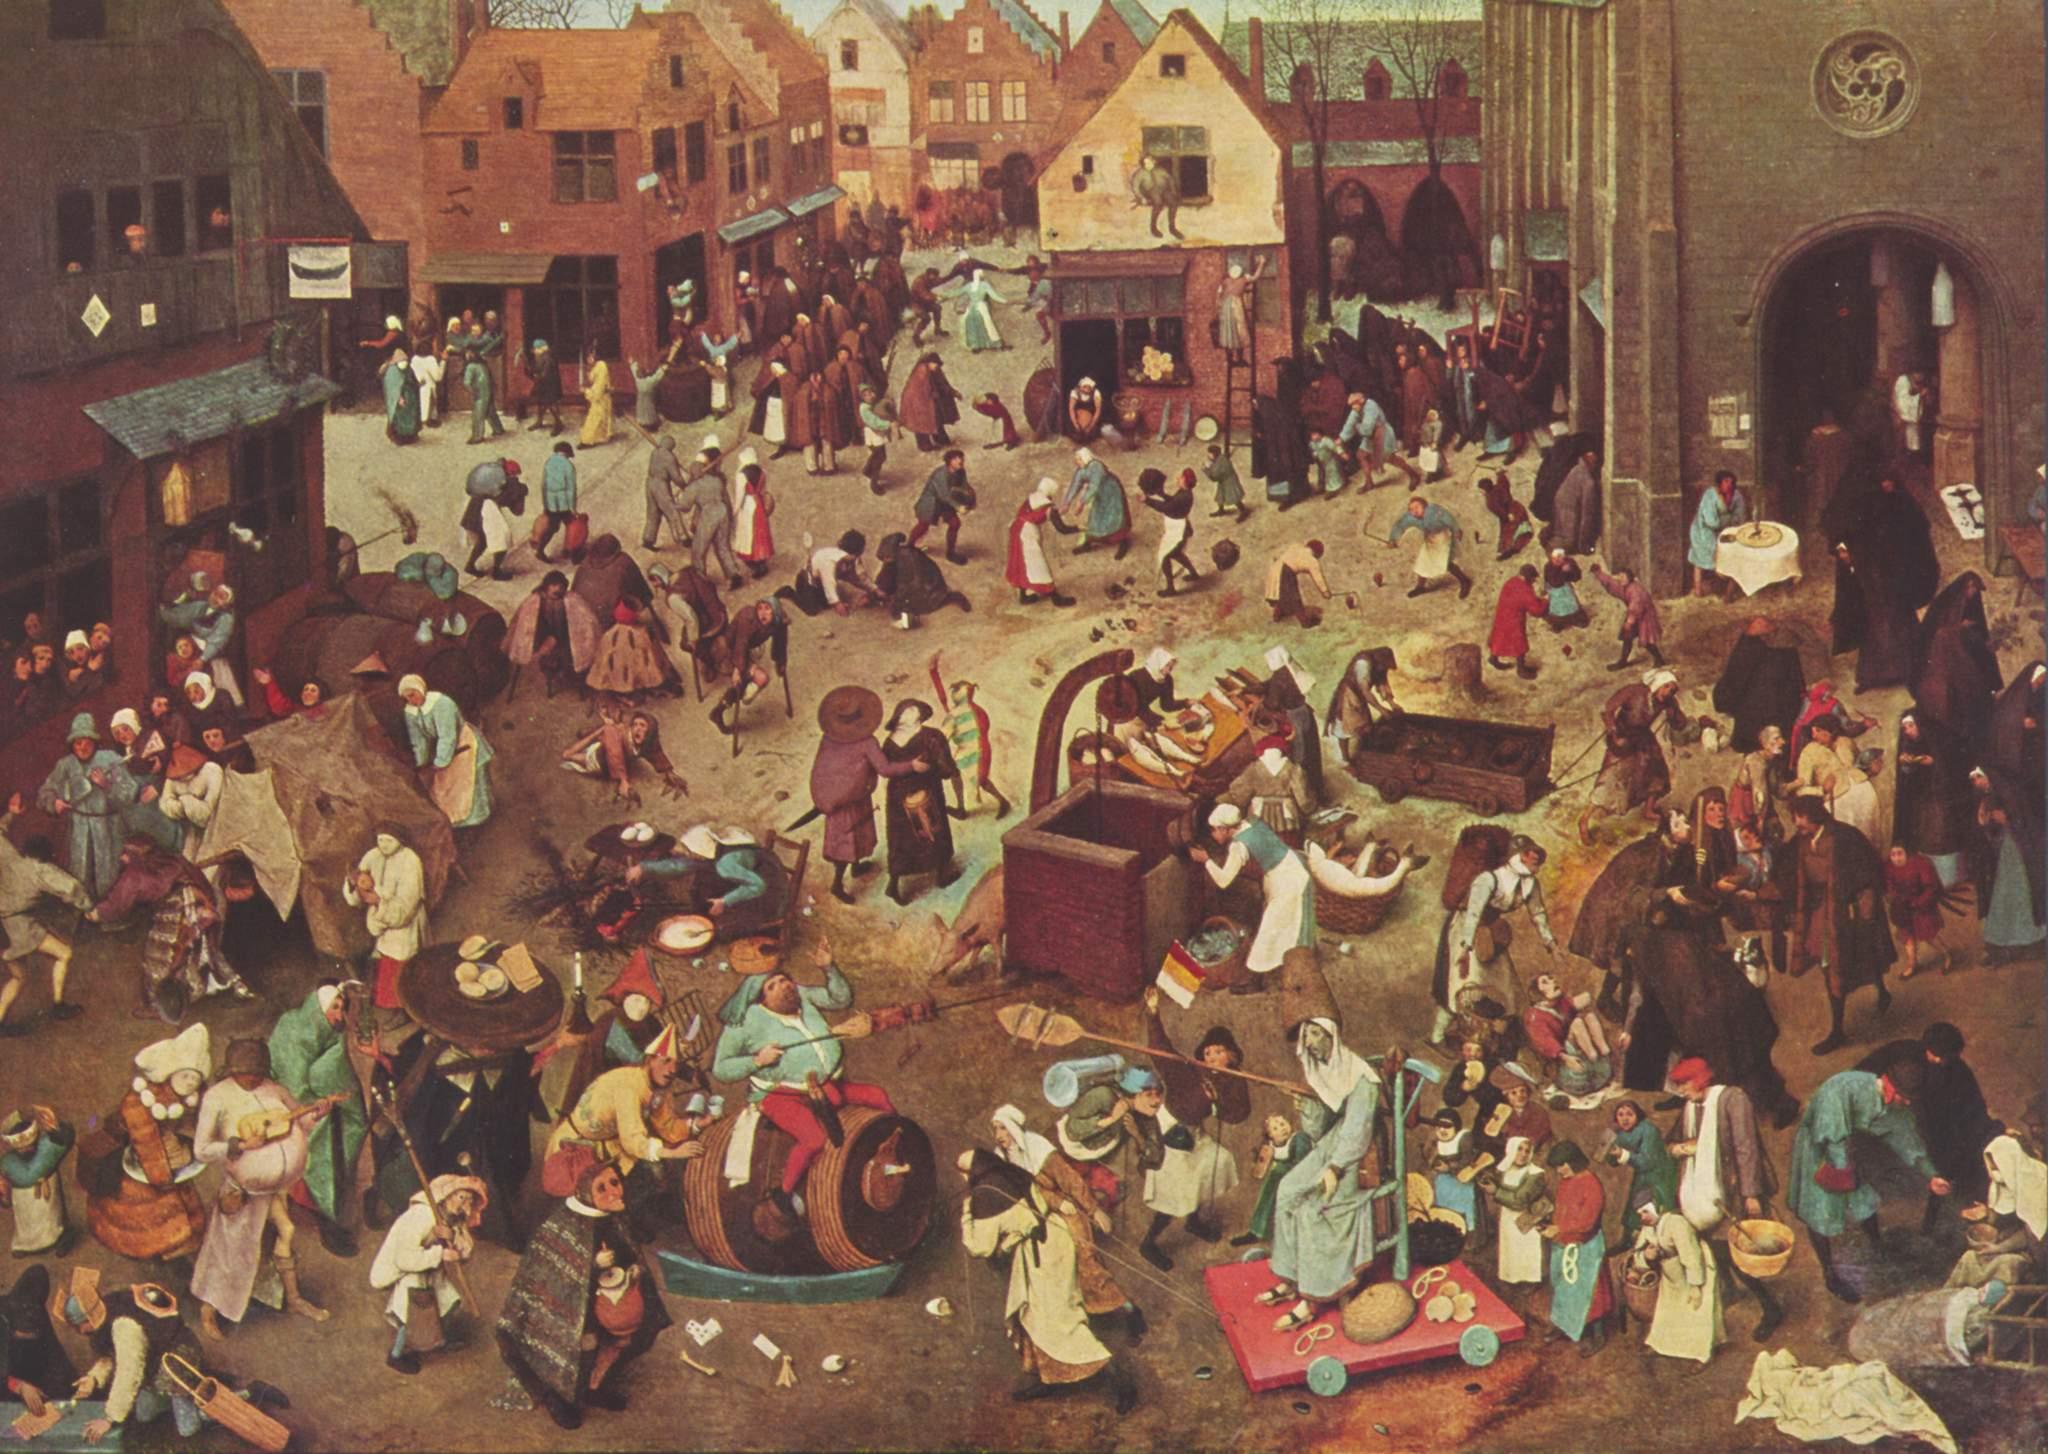 Festa carnavalesca durante a idade média.